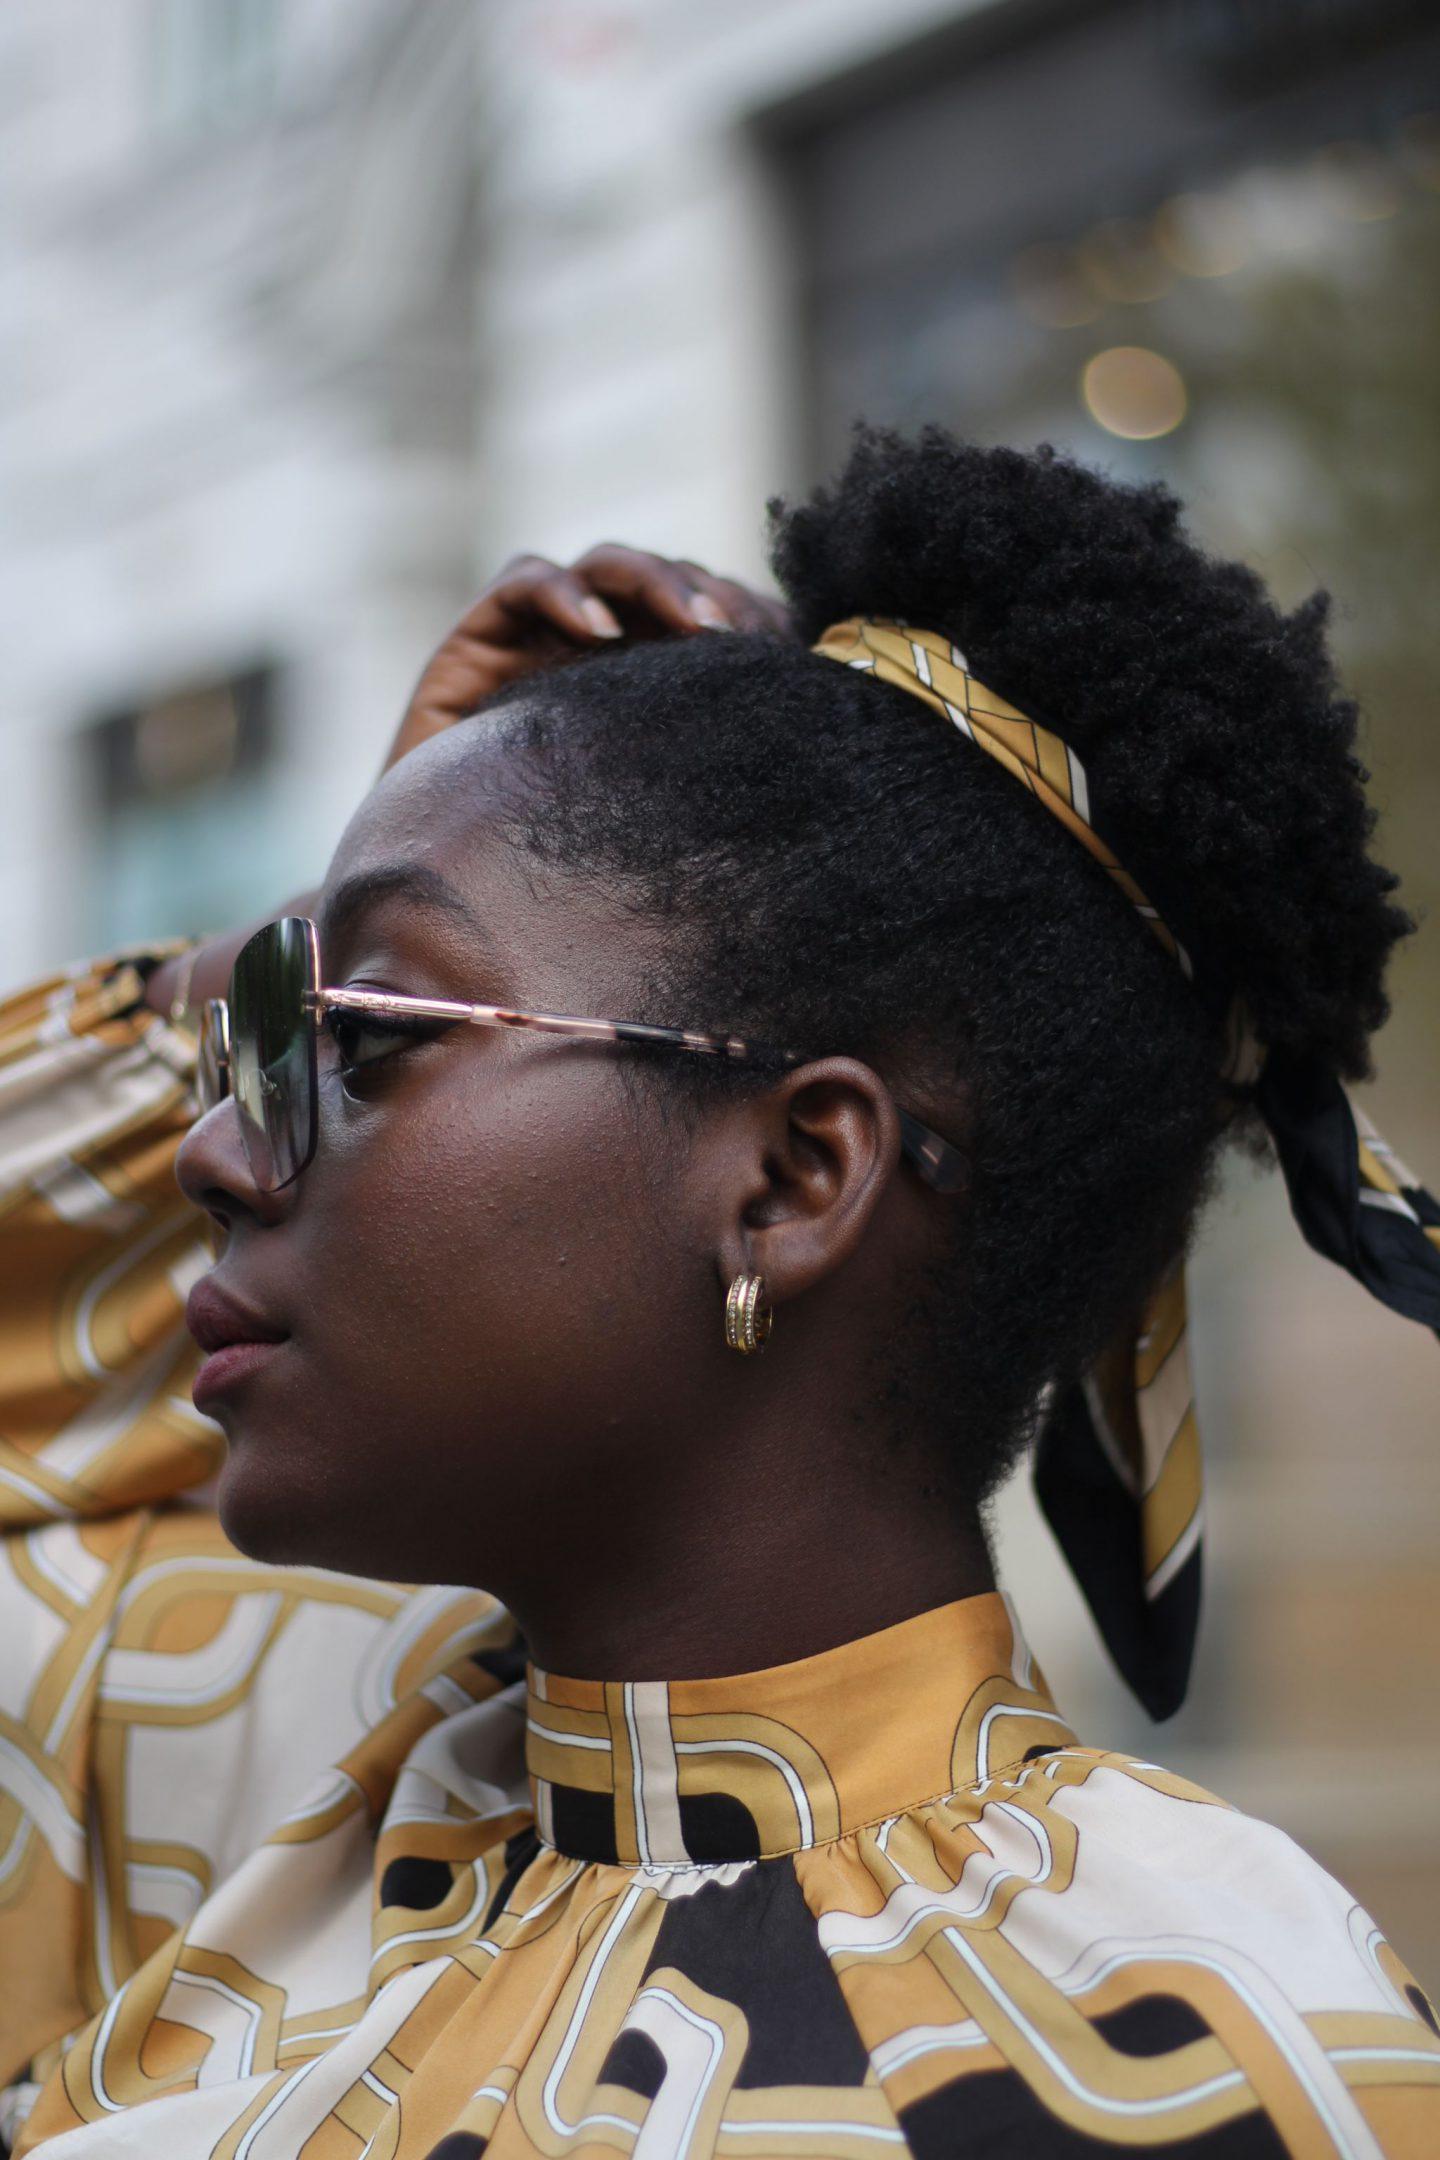 afro_hair_styles_natural_hair_Richard_Allan_HM_Lois_Opoku_streetstyle_lisforlois_2